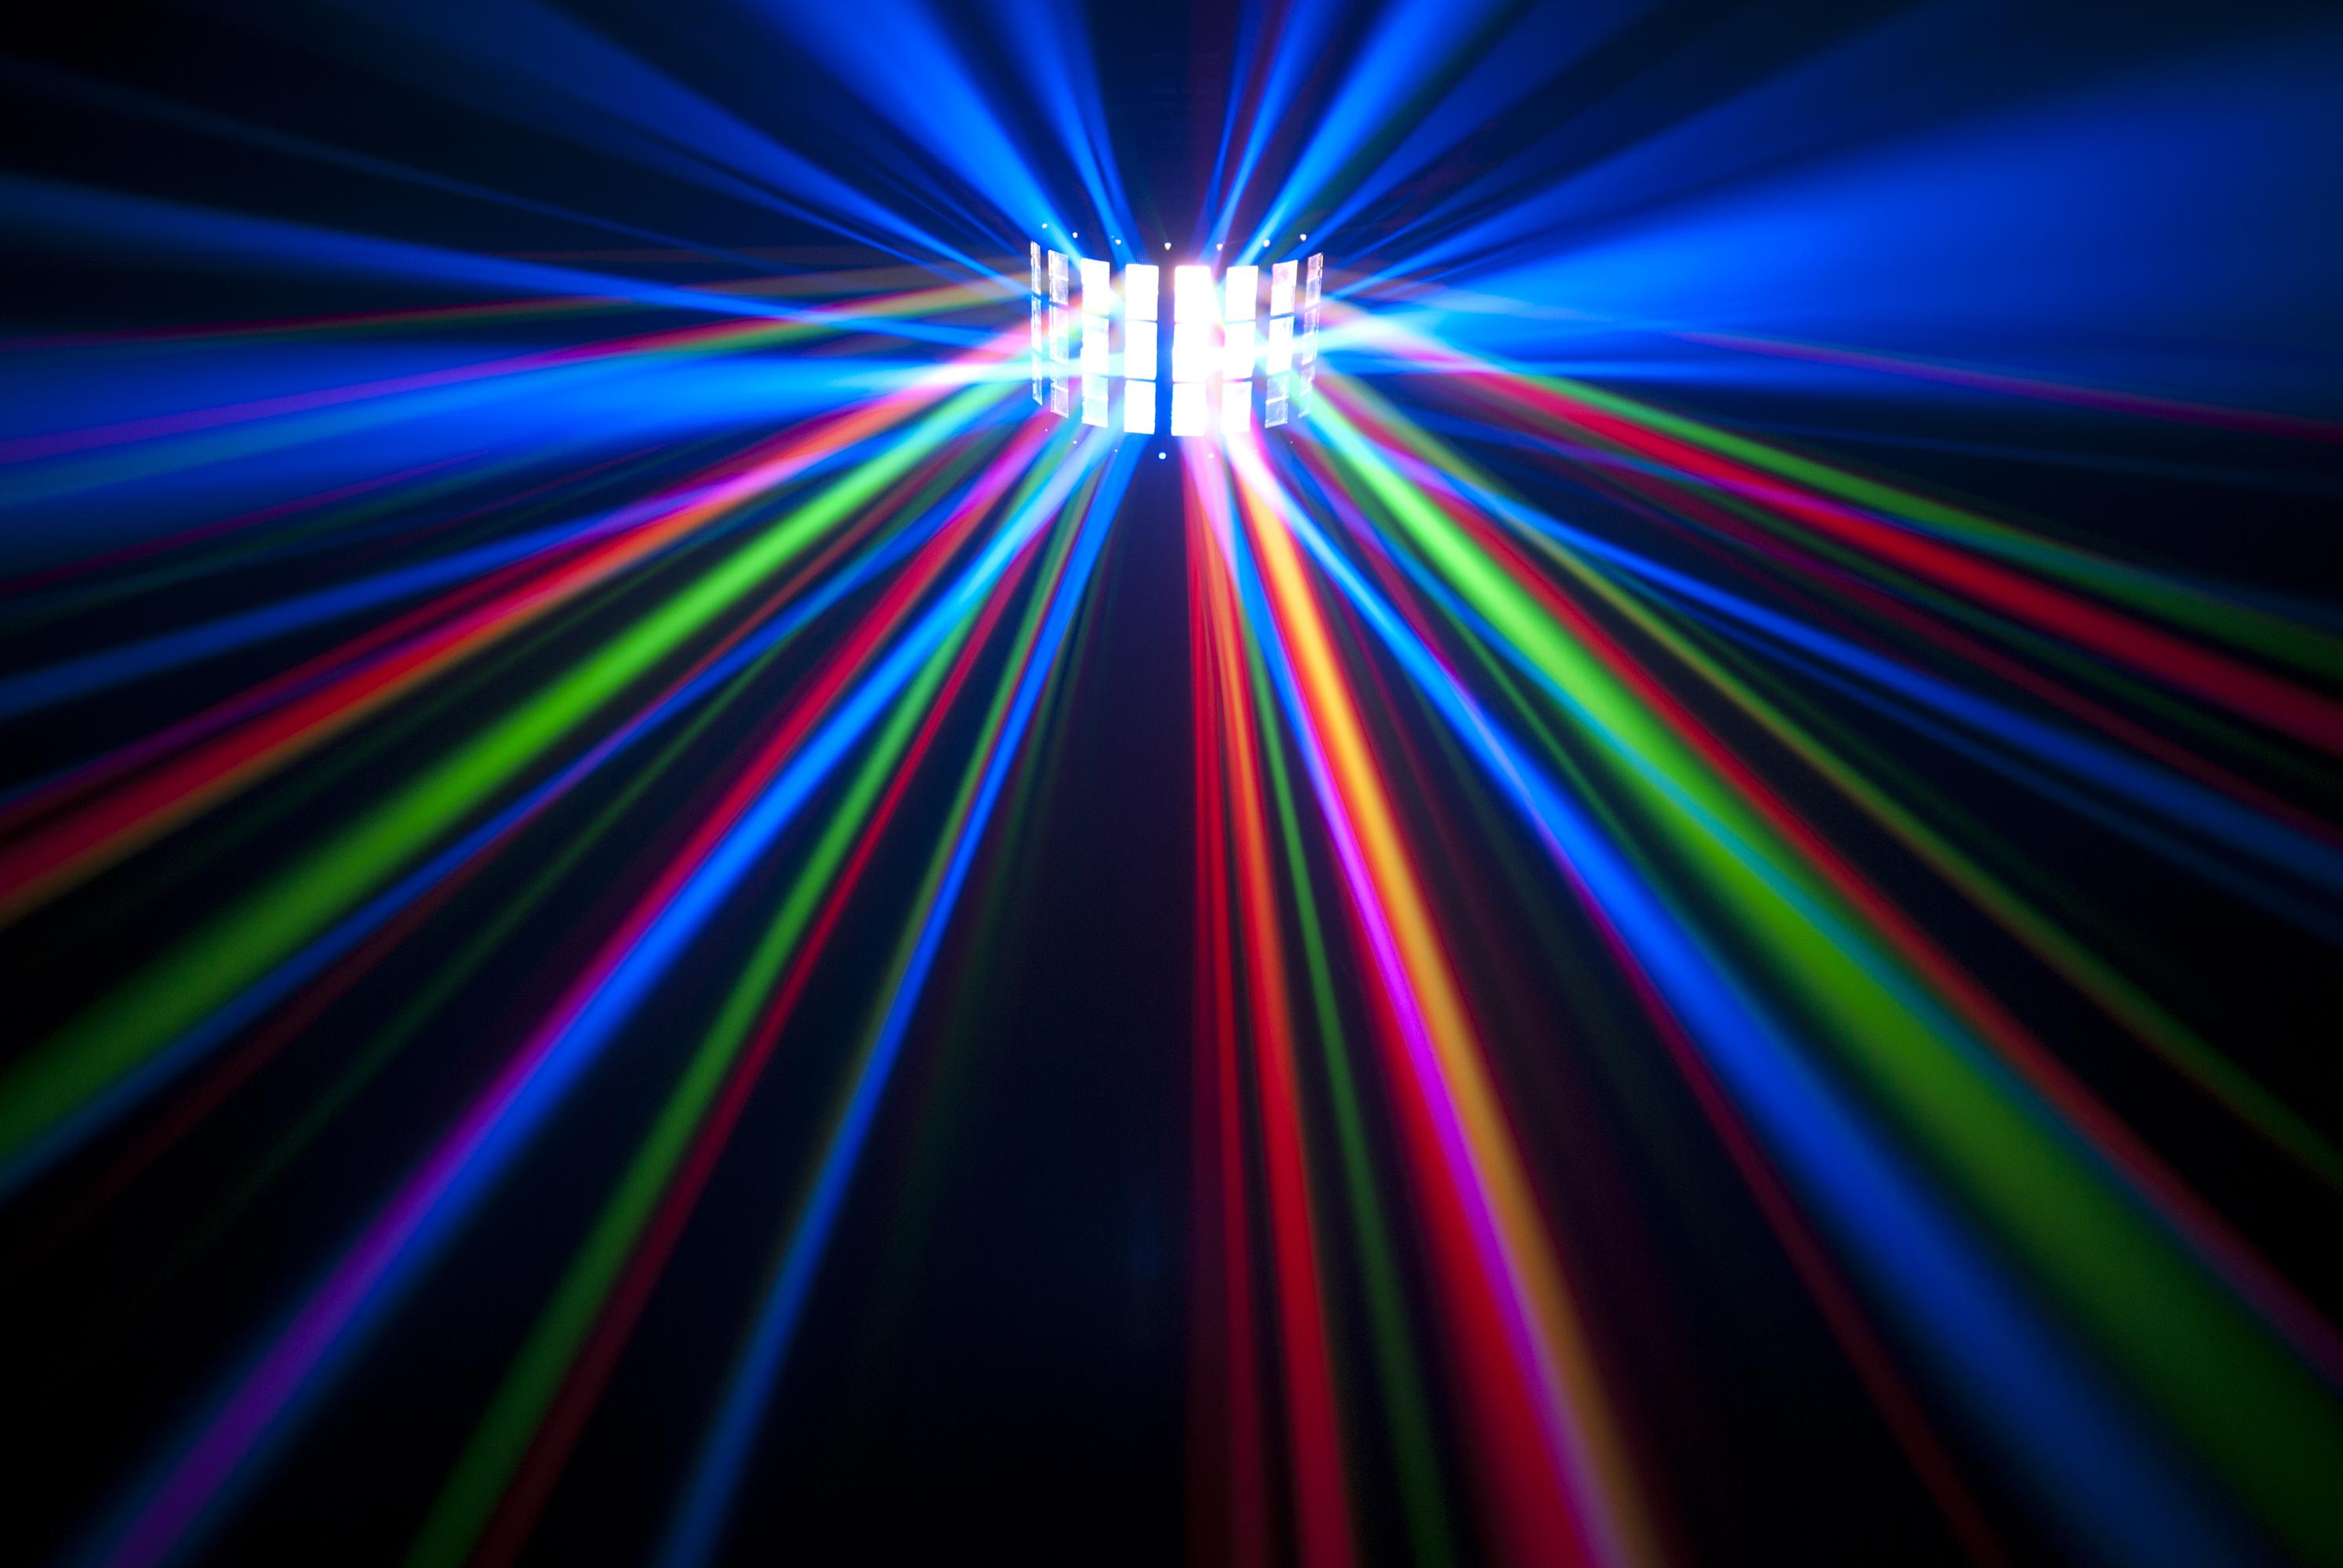 amp led lighting intimidator irc light head moving black chauvet spot lights effects american dj